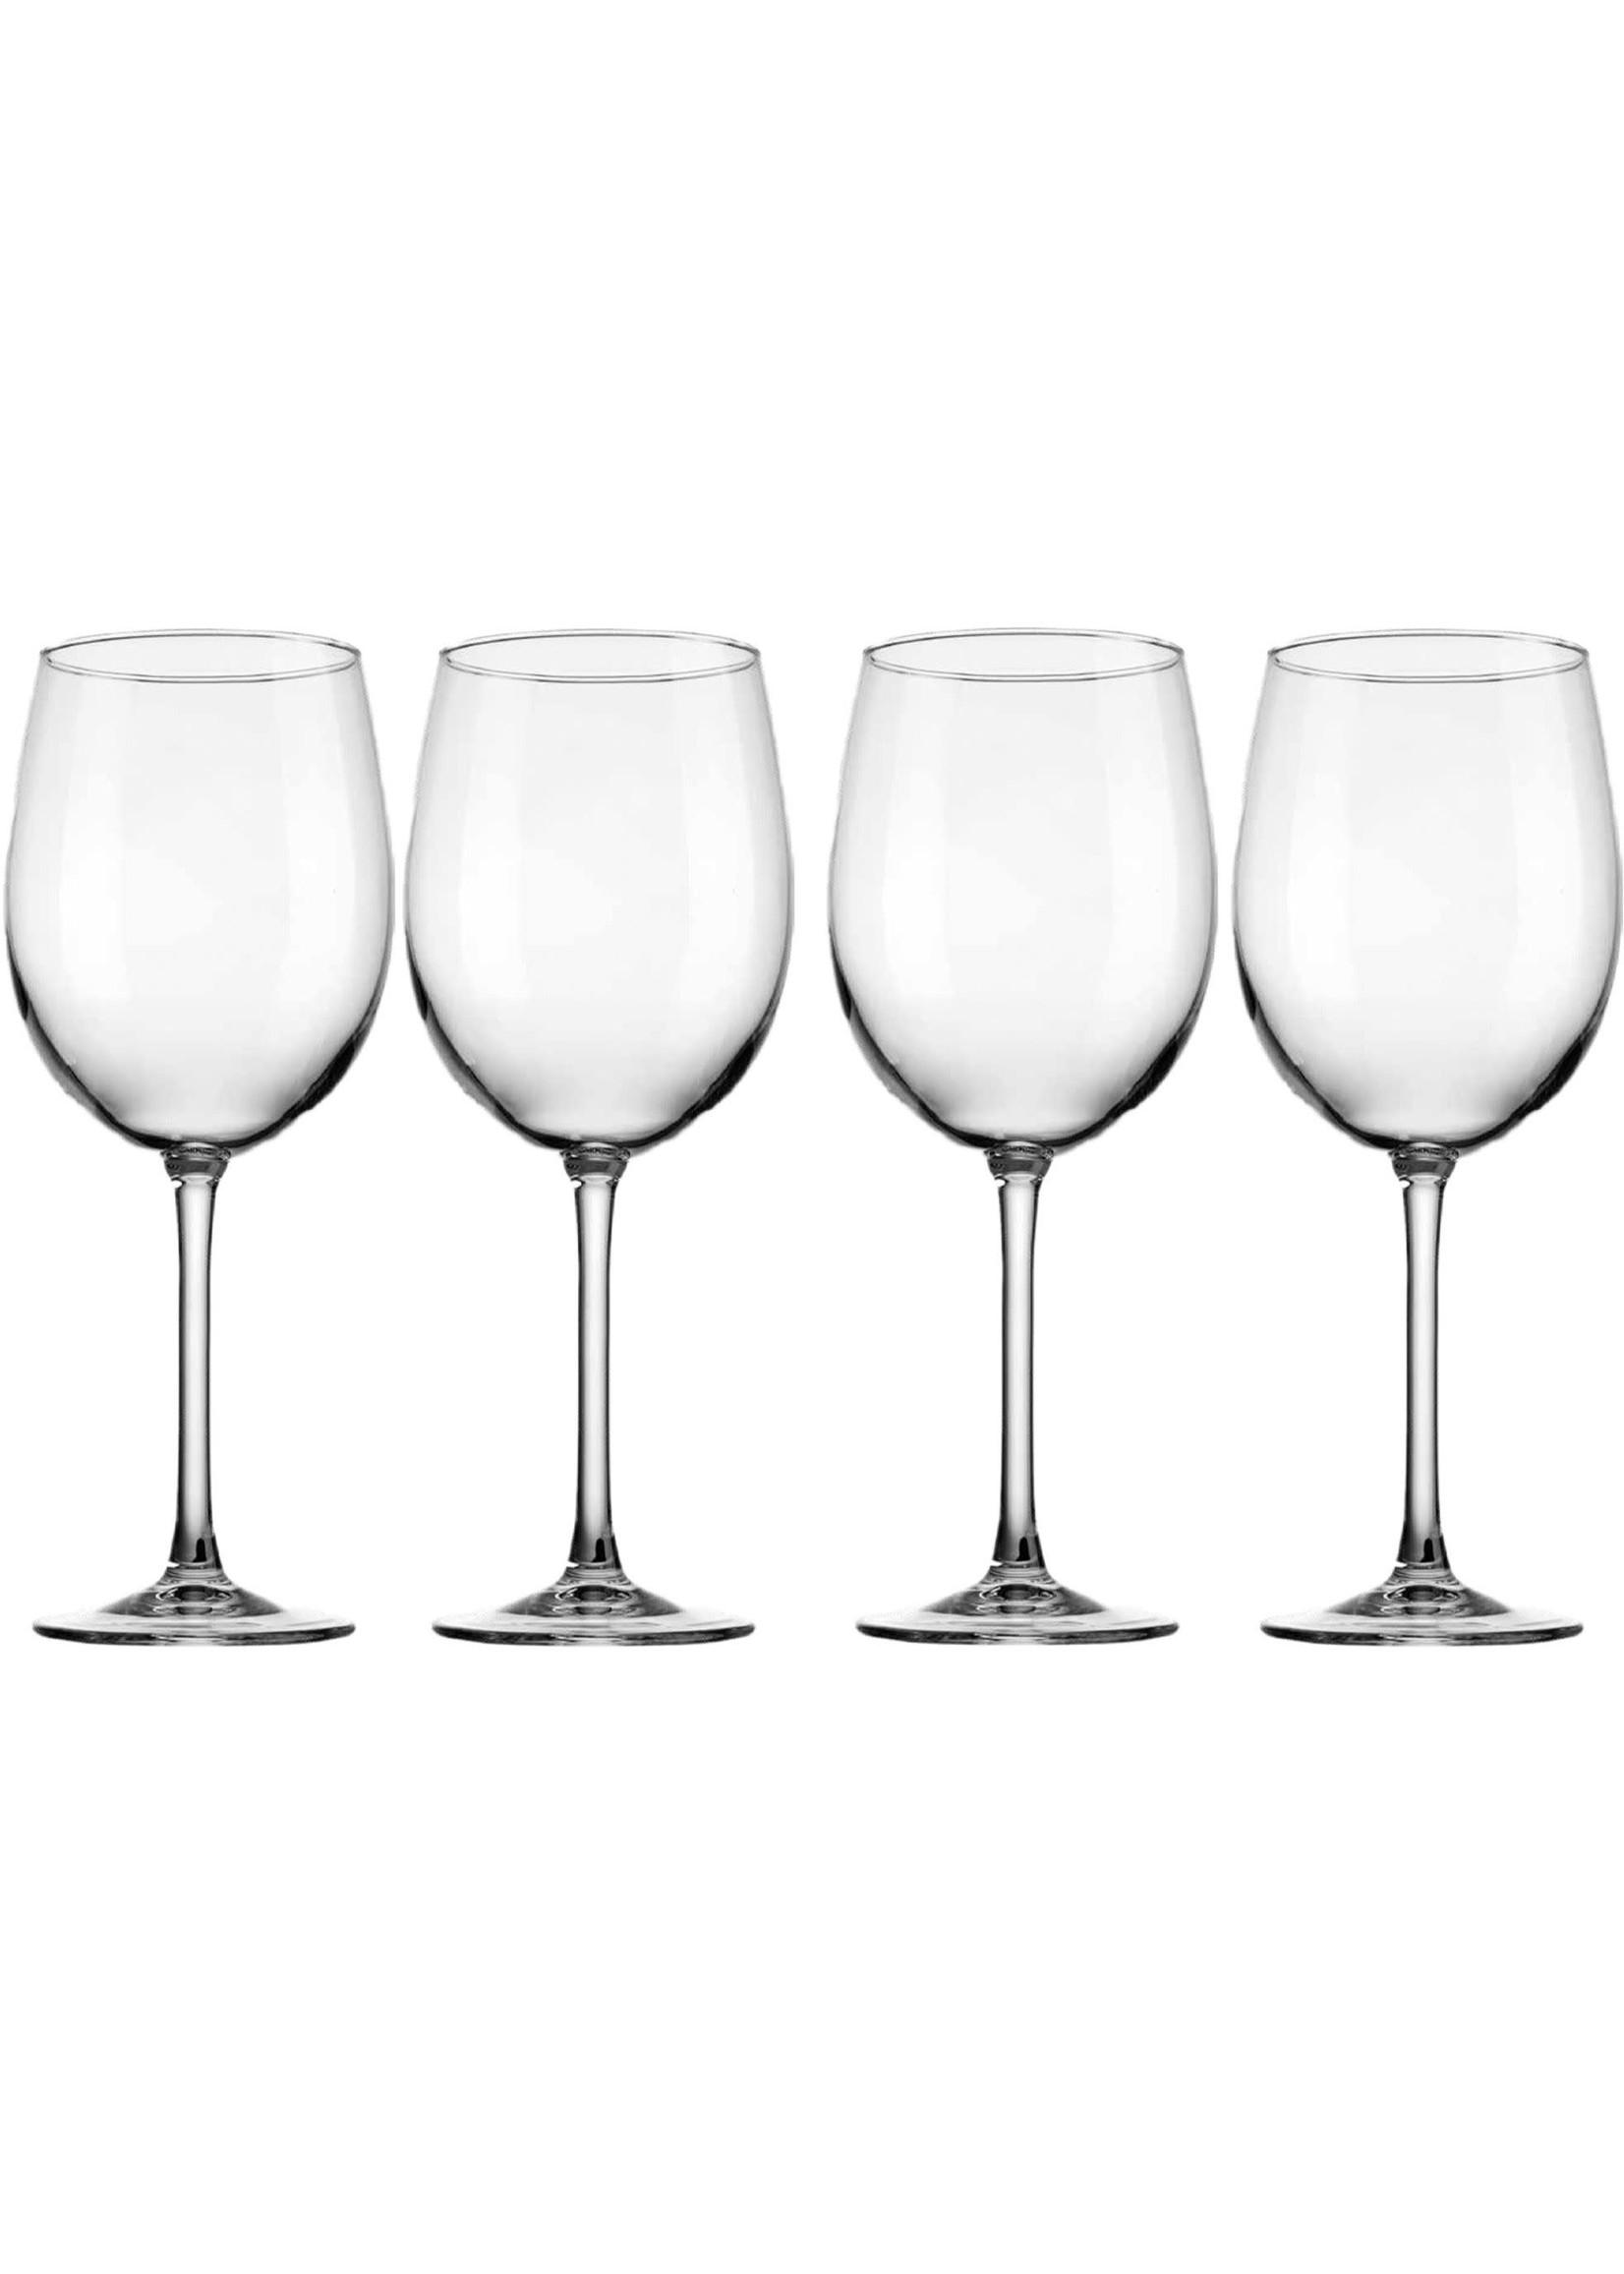 Home Essentials John M 190 oz White Wine Glass - Set of 4